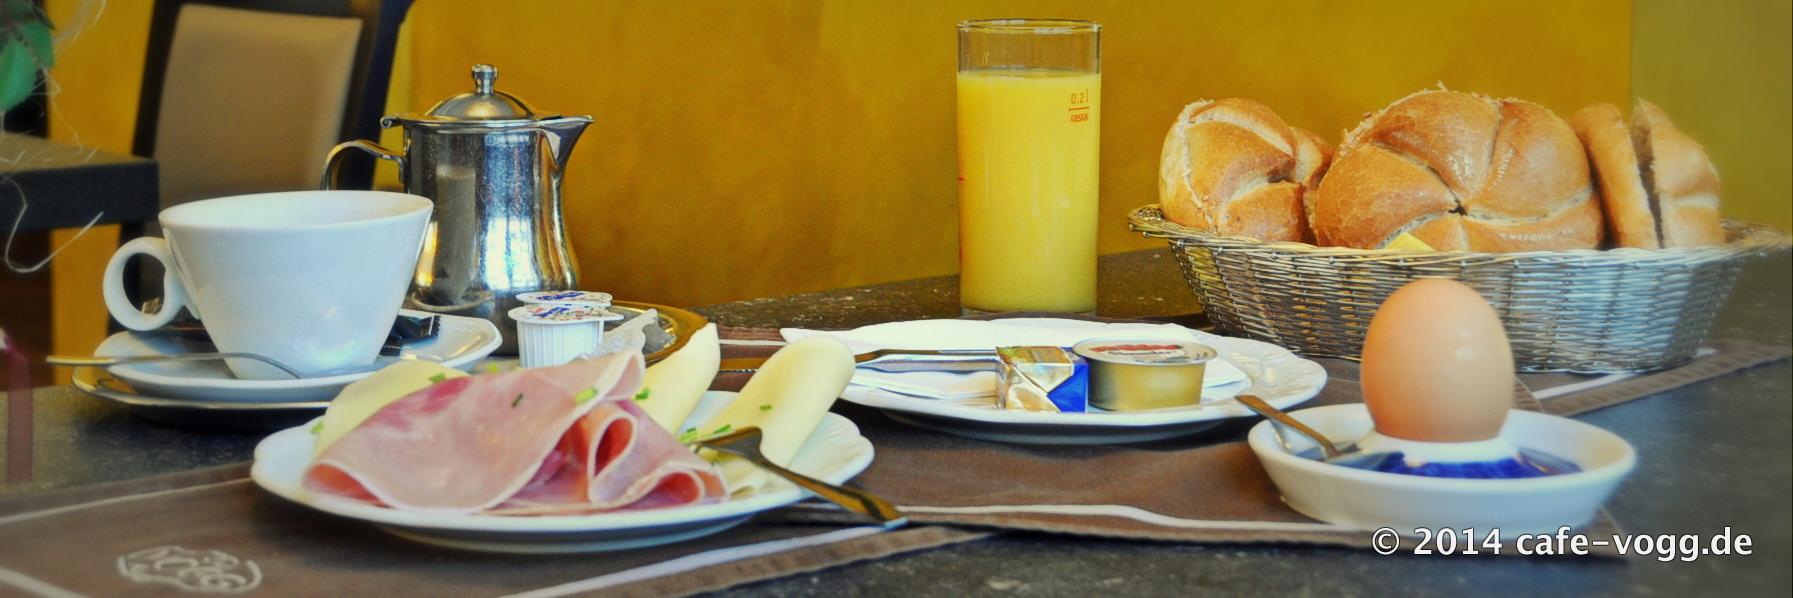 50 Jahre Frühstück